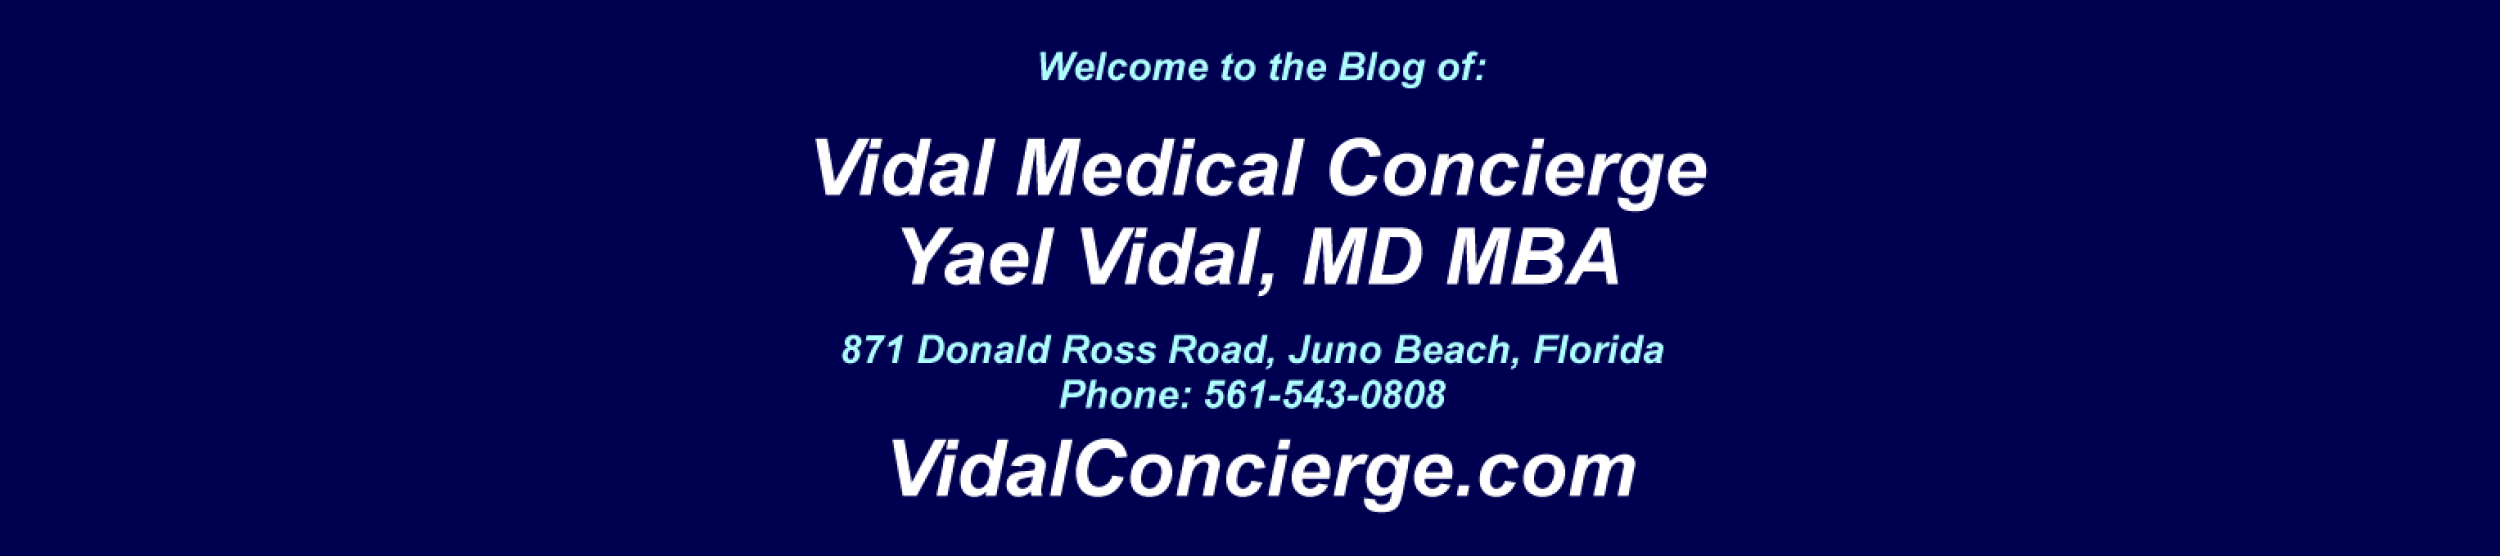 Jupiter Concierge Doctor – Palm Beach Gardens Concierge Physician